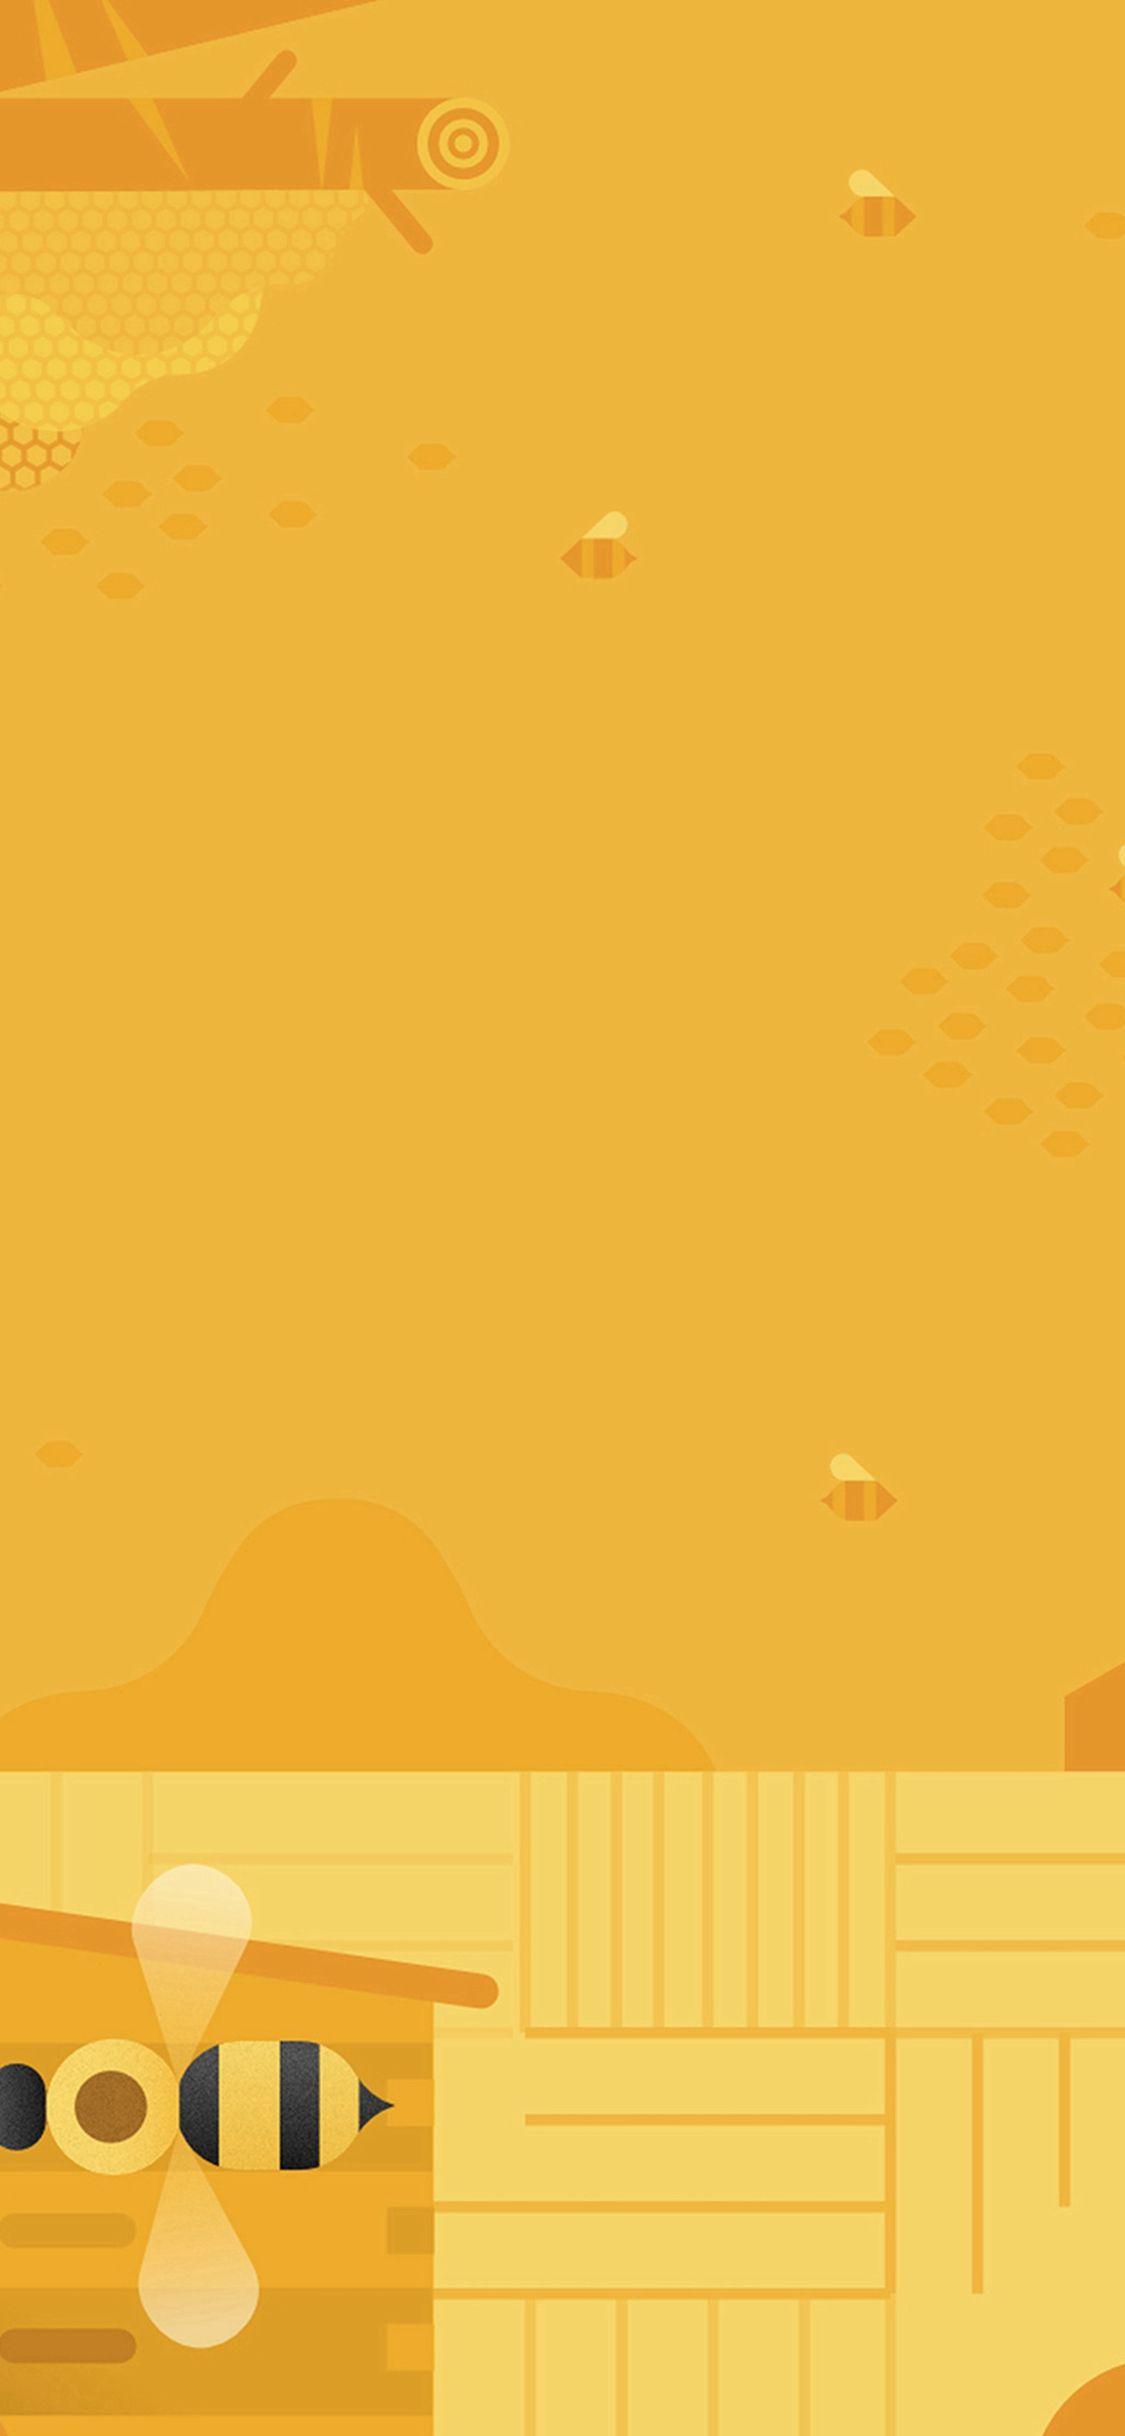 Minimal Honey Yellow Art Illustration Cute Iphone X Wallpaper Yellow Art Cute Iphone 6 Wallpaper Iphone 6 Wallpaper